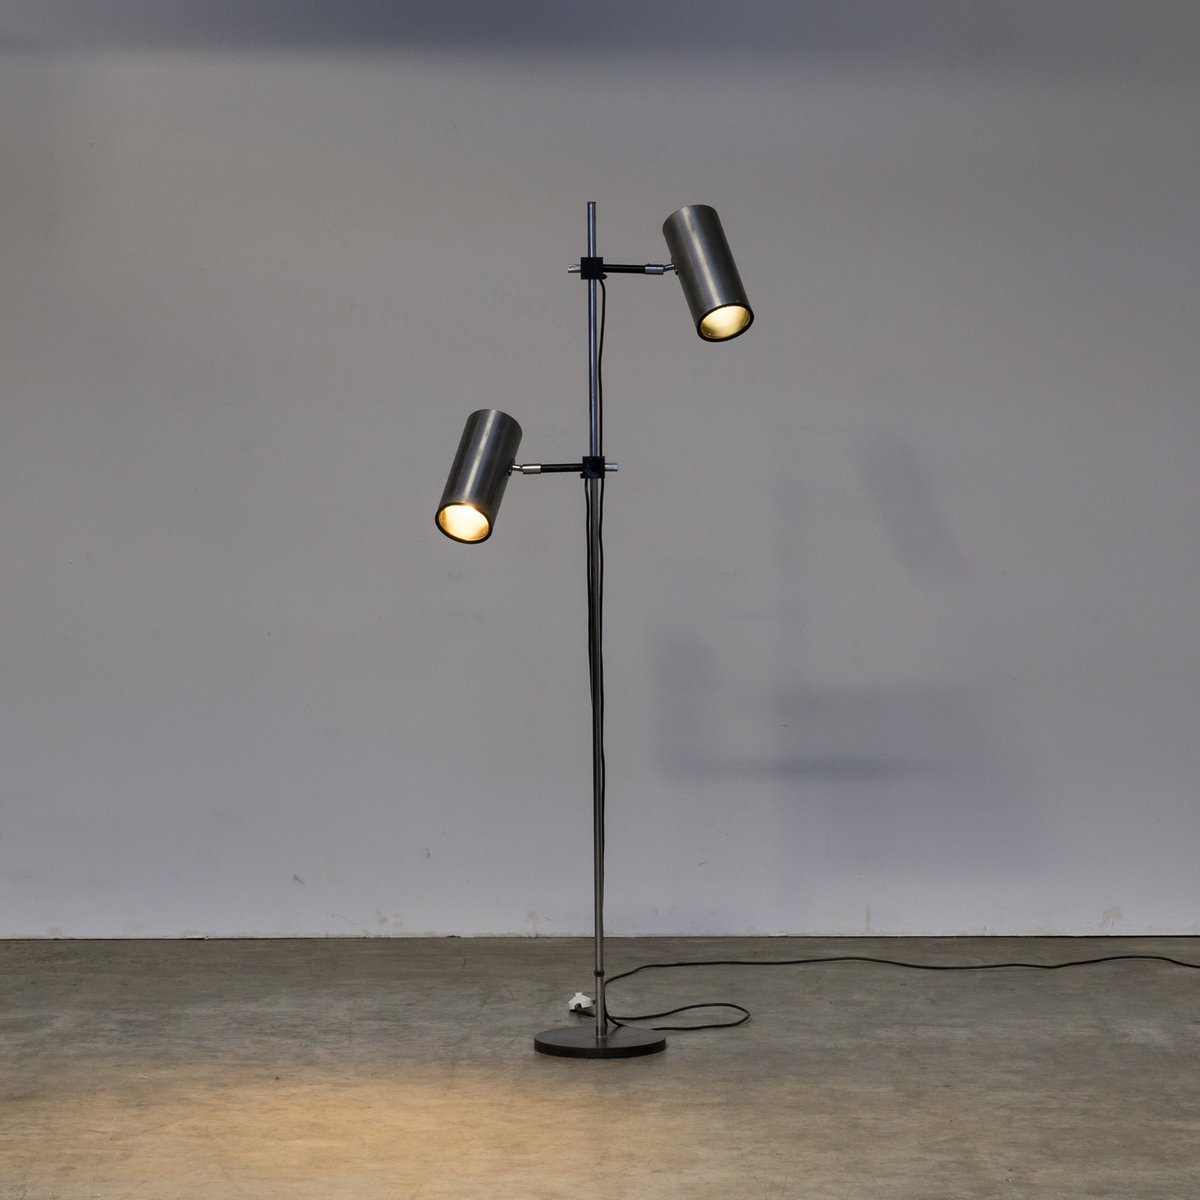 Stehlampe Edelstahl Vintage Nautisch Stativ Projektor Stehlampe